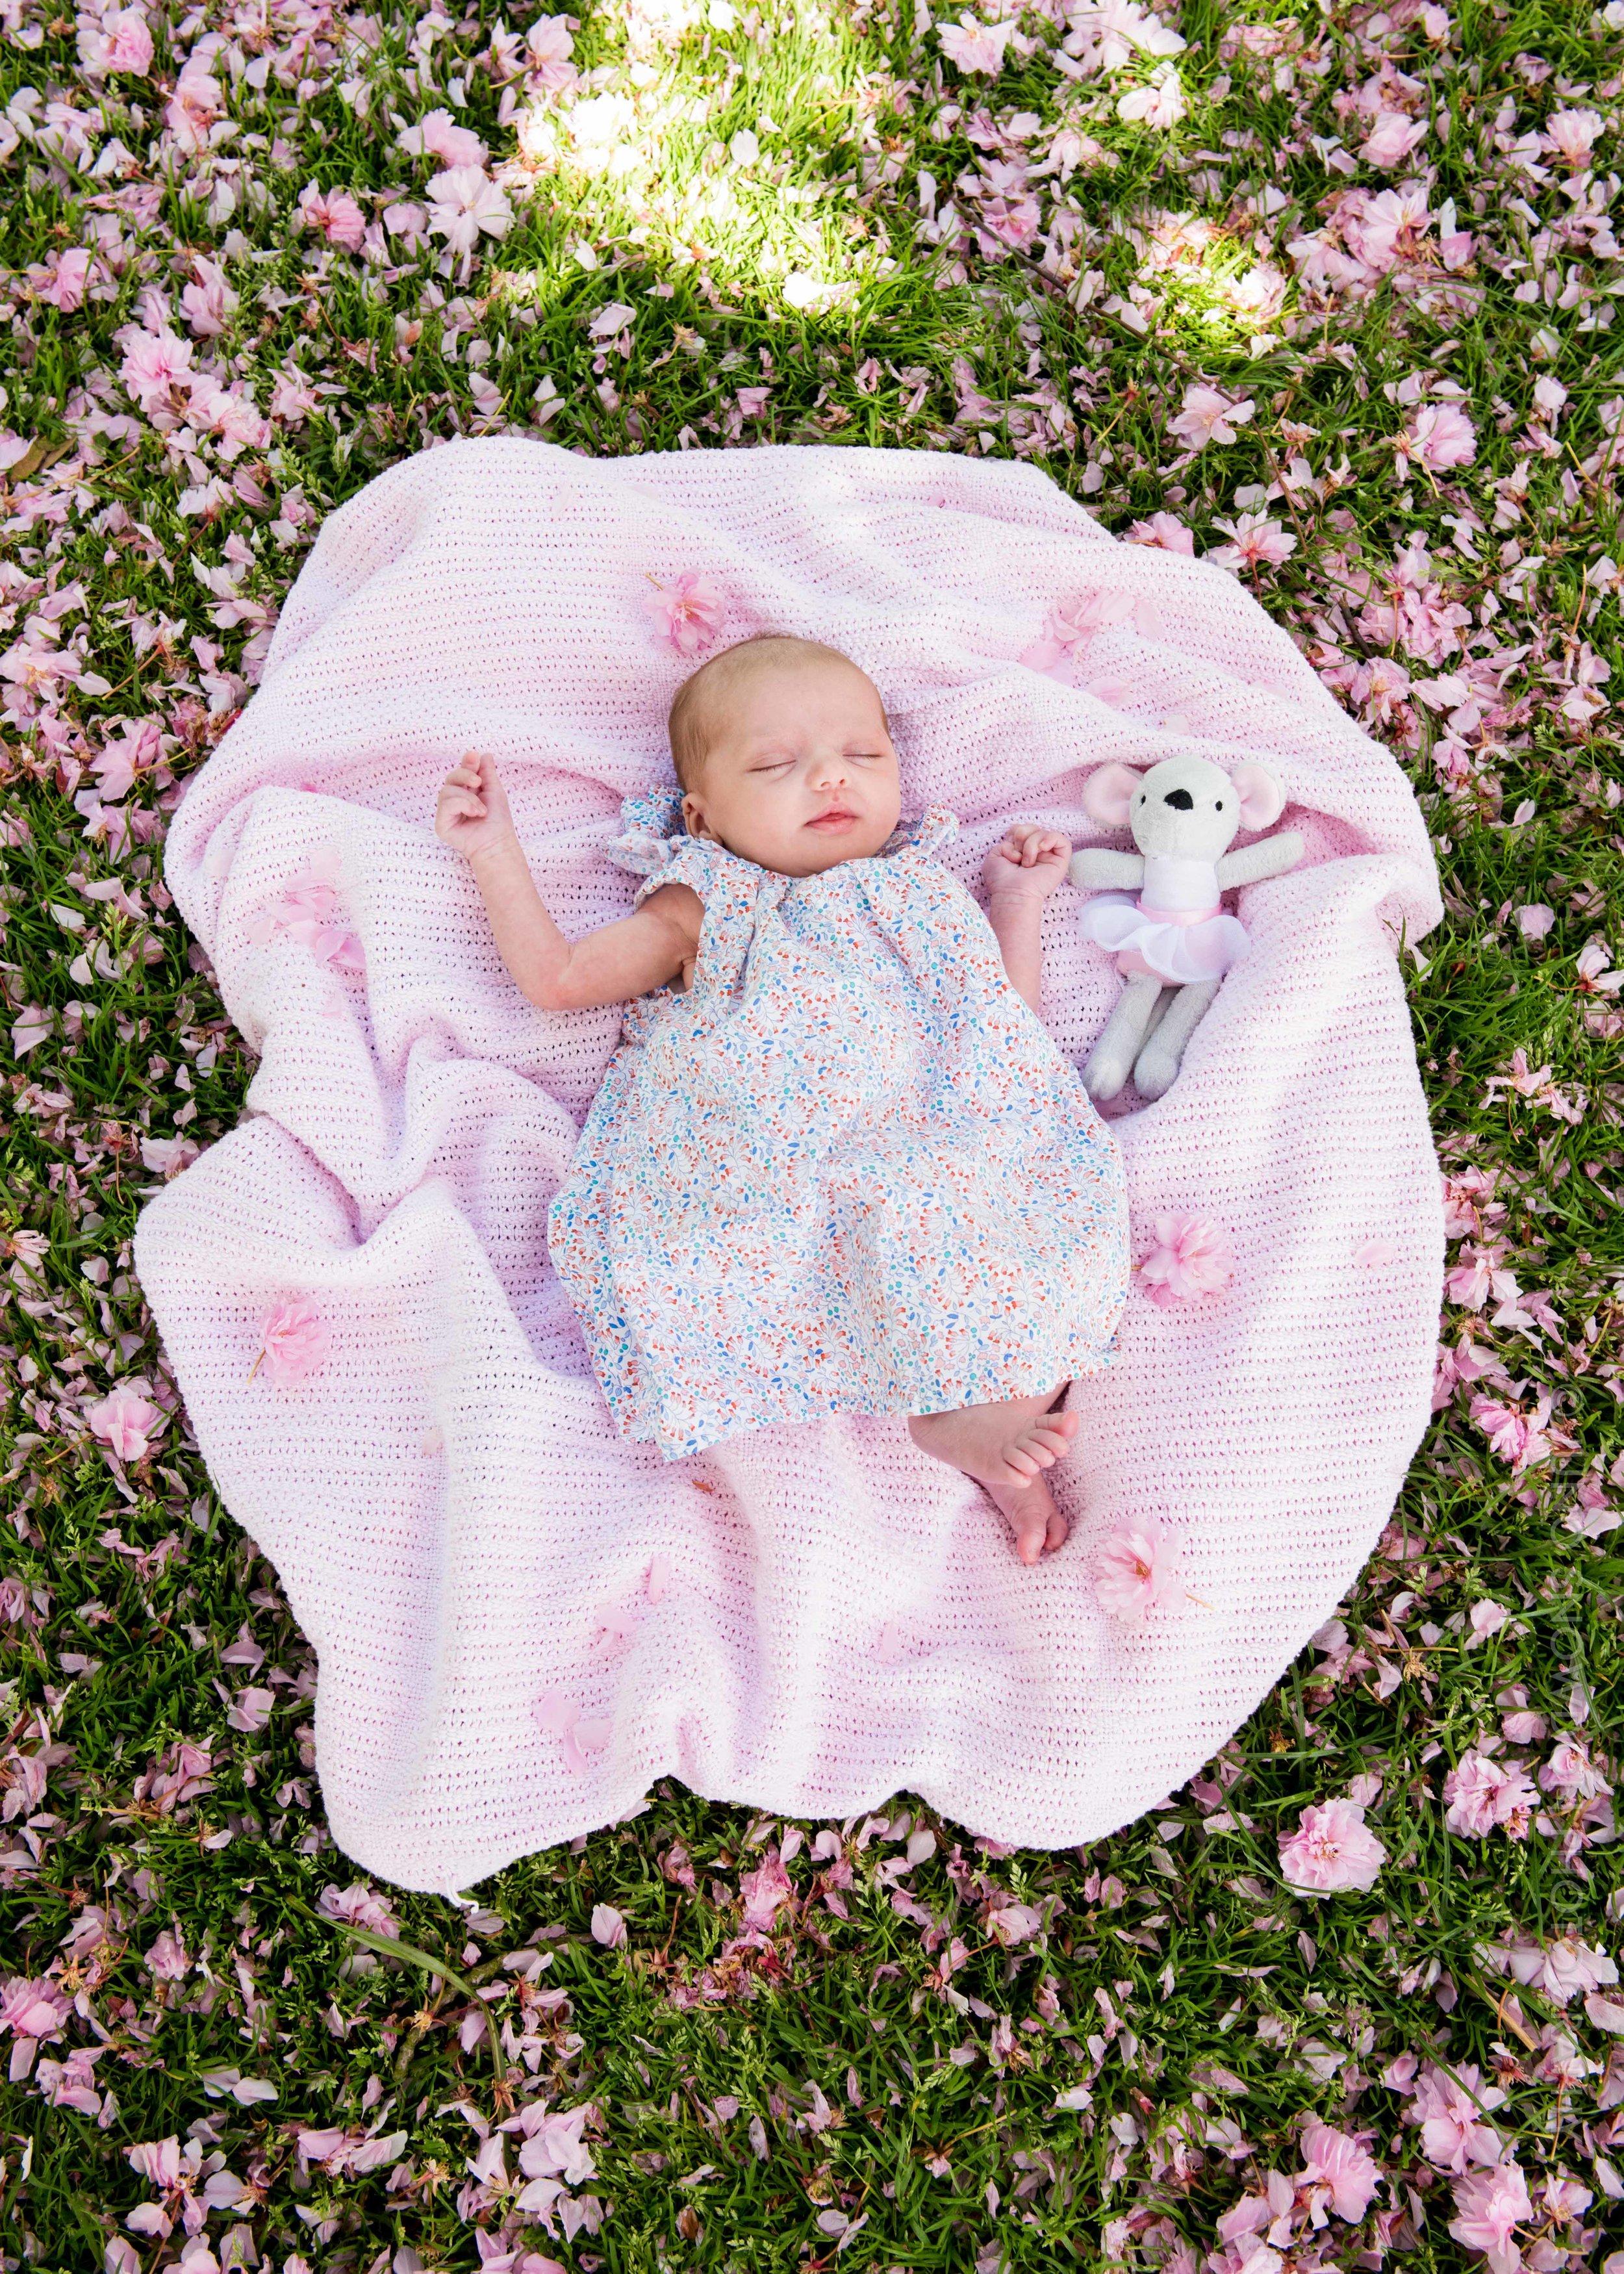 juno-snowdon-photography-newborn-6042.jpg